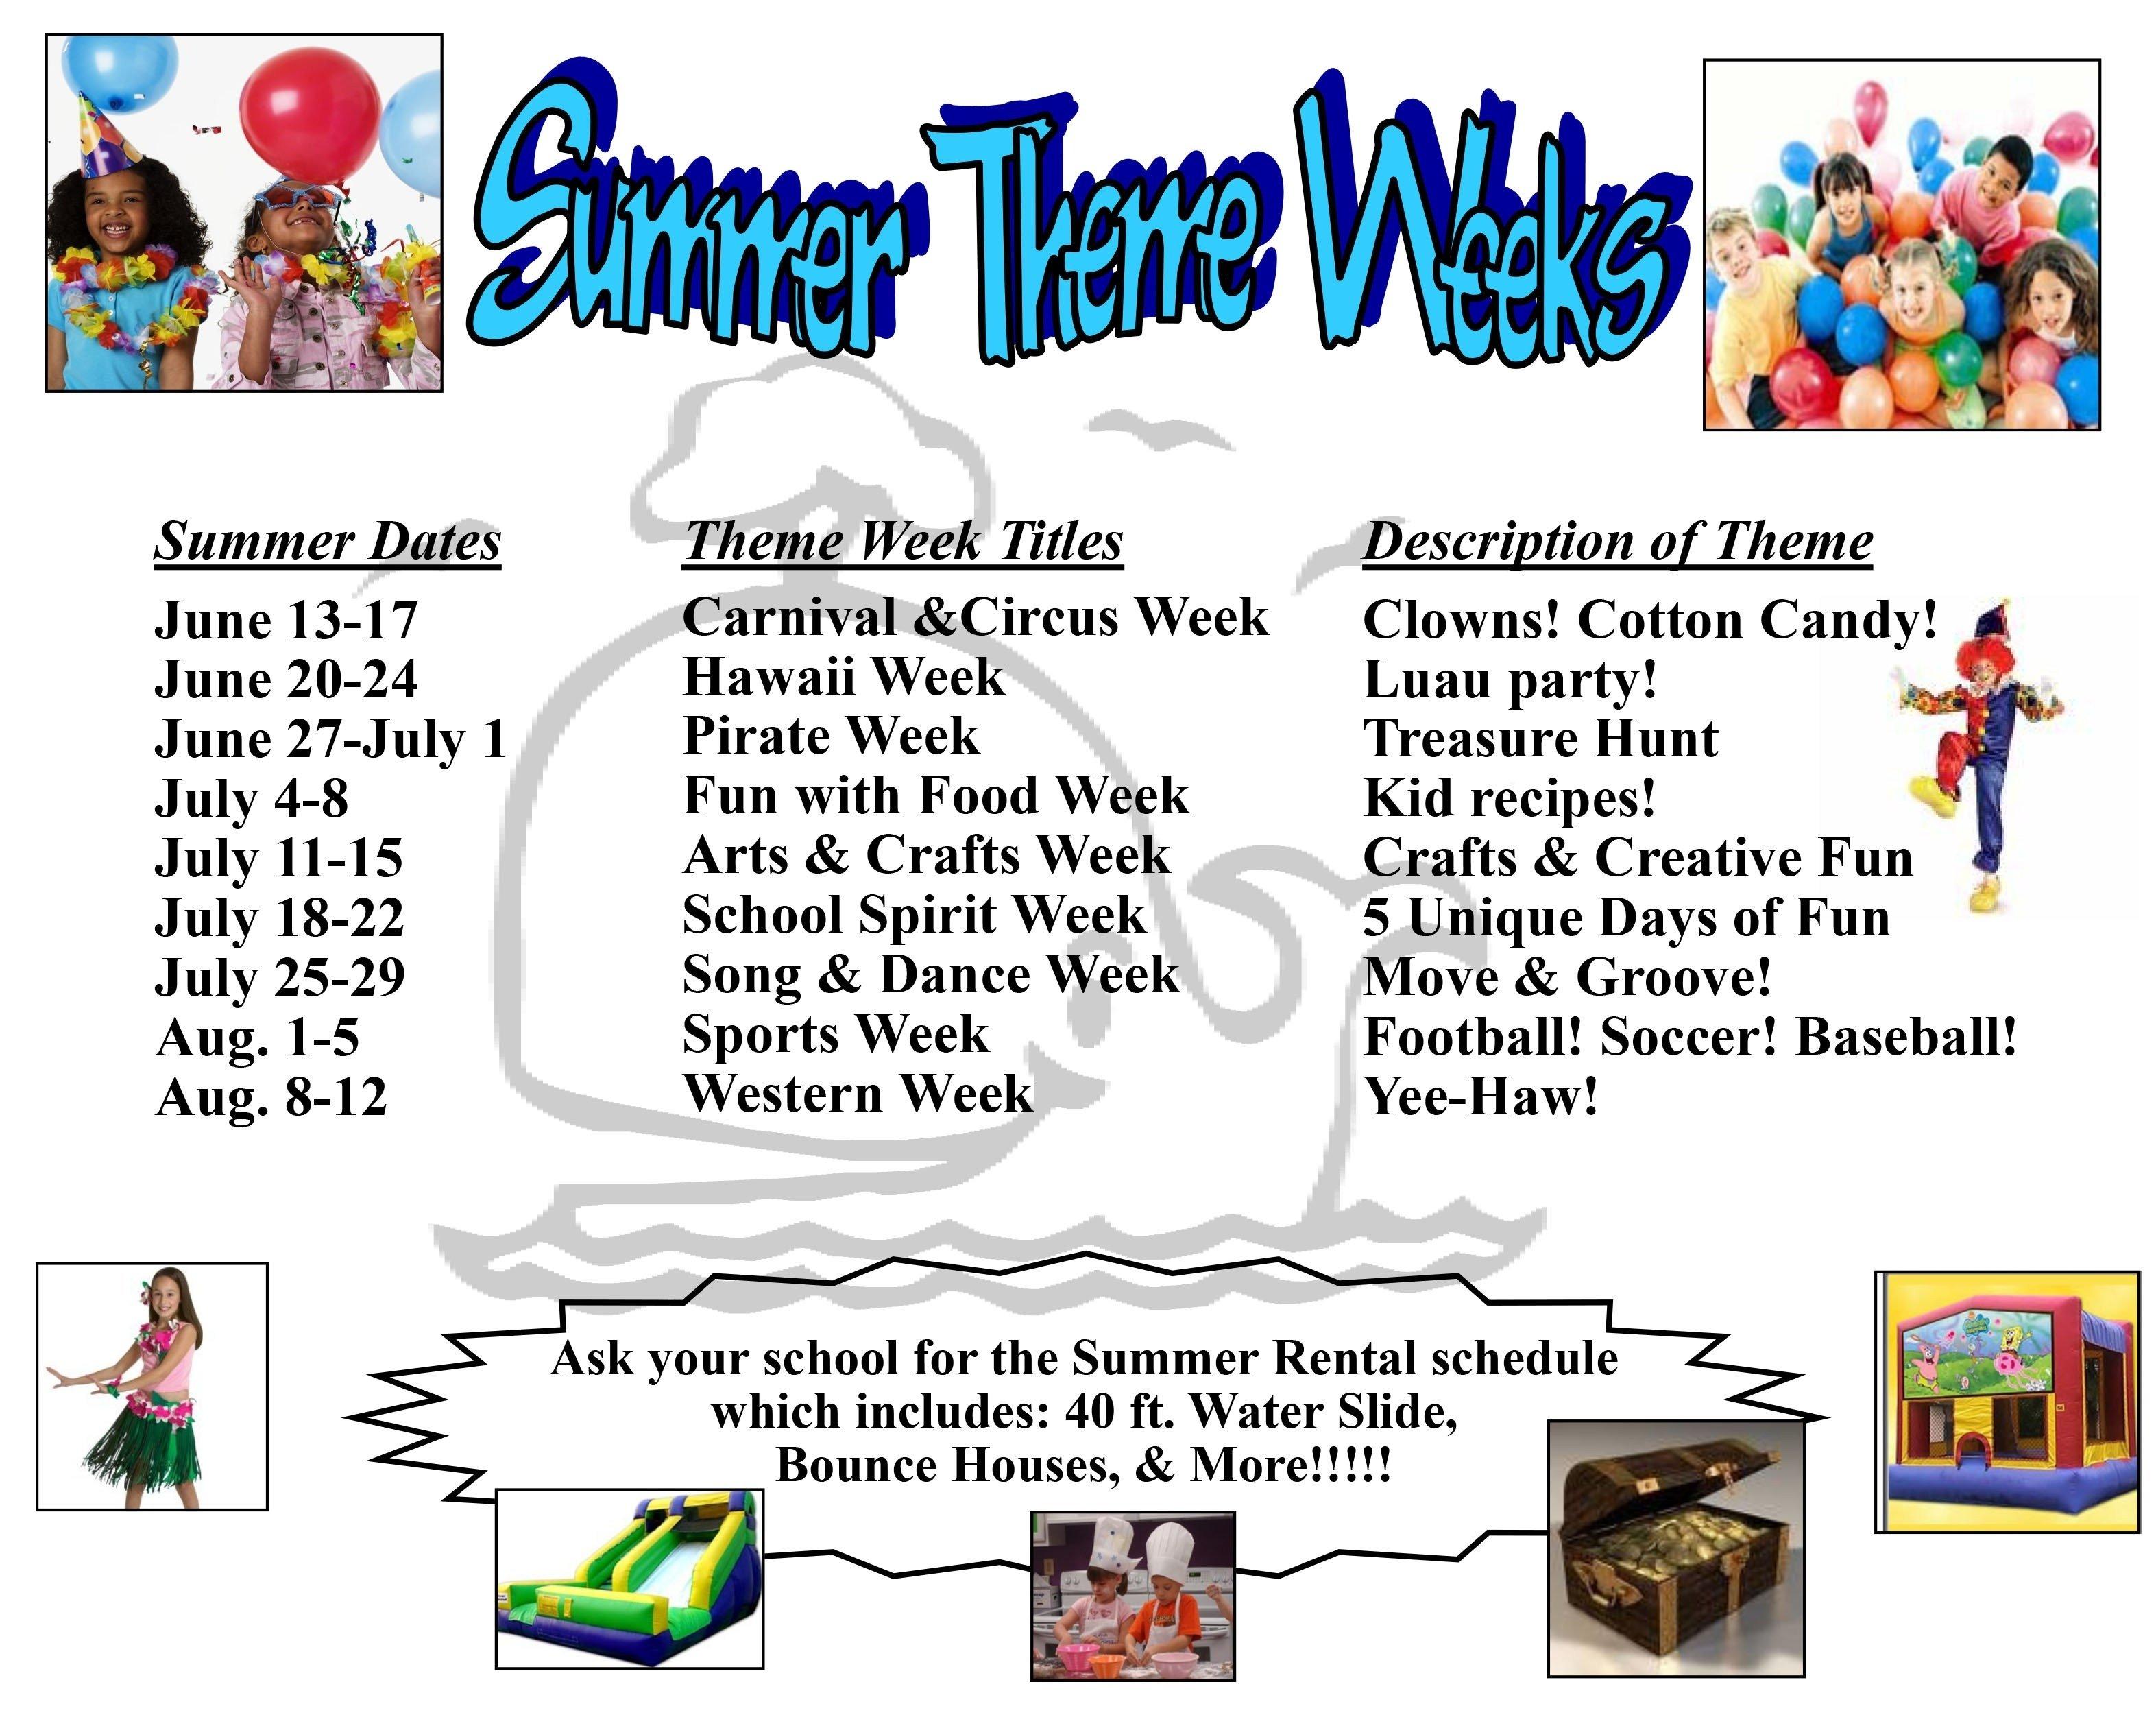 10 Great Summer Camp Theme Week Ideas summer 2016 theme week schedule official grace community school blog 2020